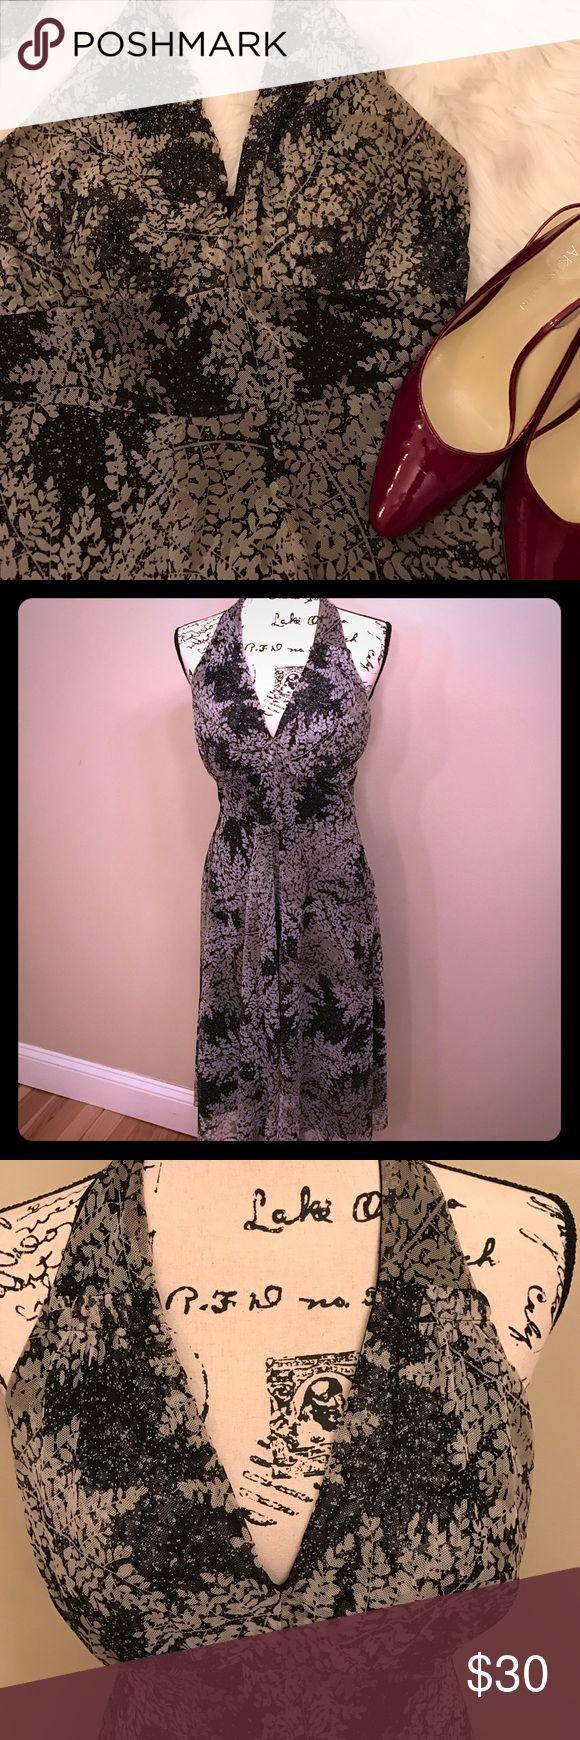 "Calvin Klein halter dress. Calvin Klein halter dress. Grey and black leaf pattern. Zipper up back. Shell 80% polyester 20% spandex. Lining 95% polyester 5% spandex. Hem is 30"" from lowest point of v neck Calvin Klein Dresses"